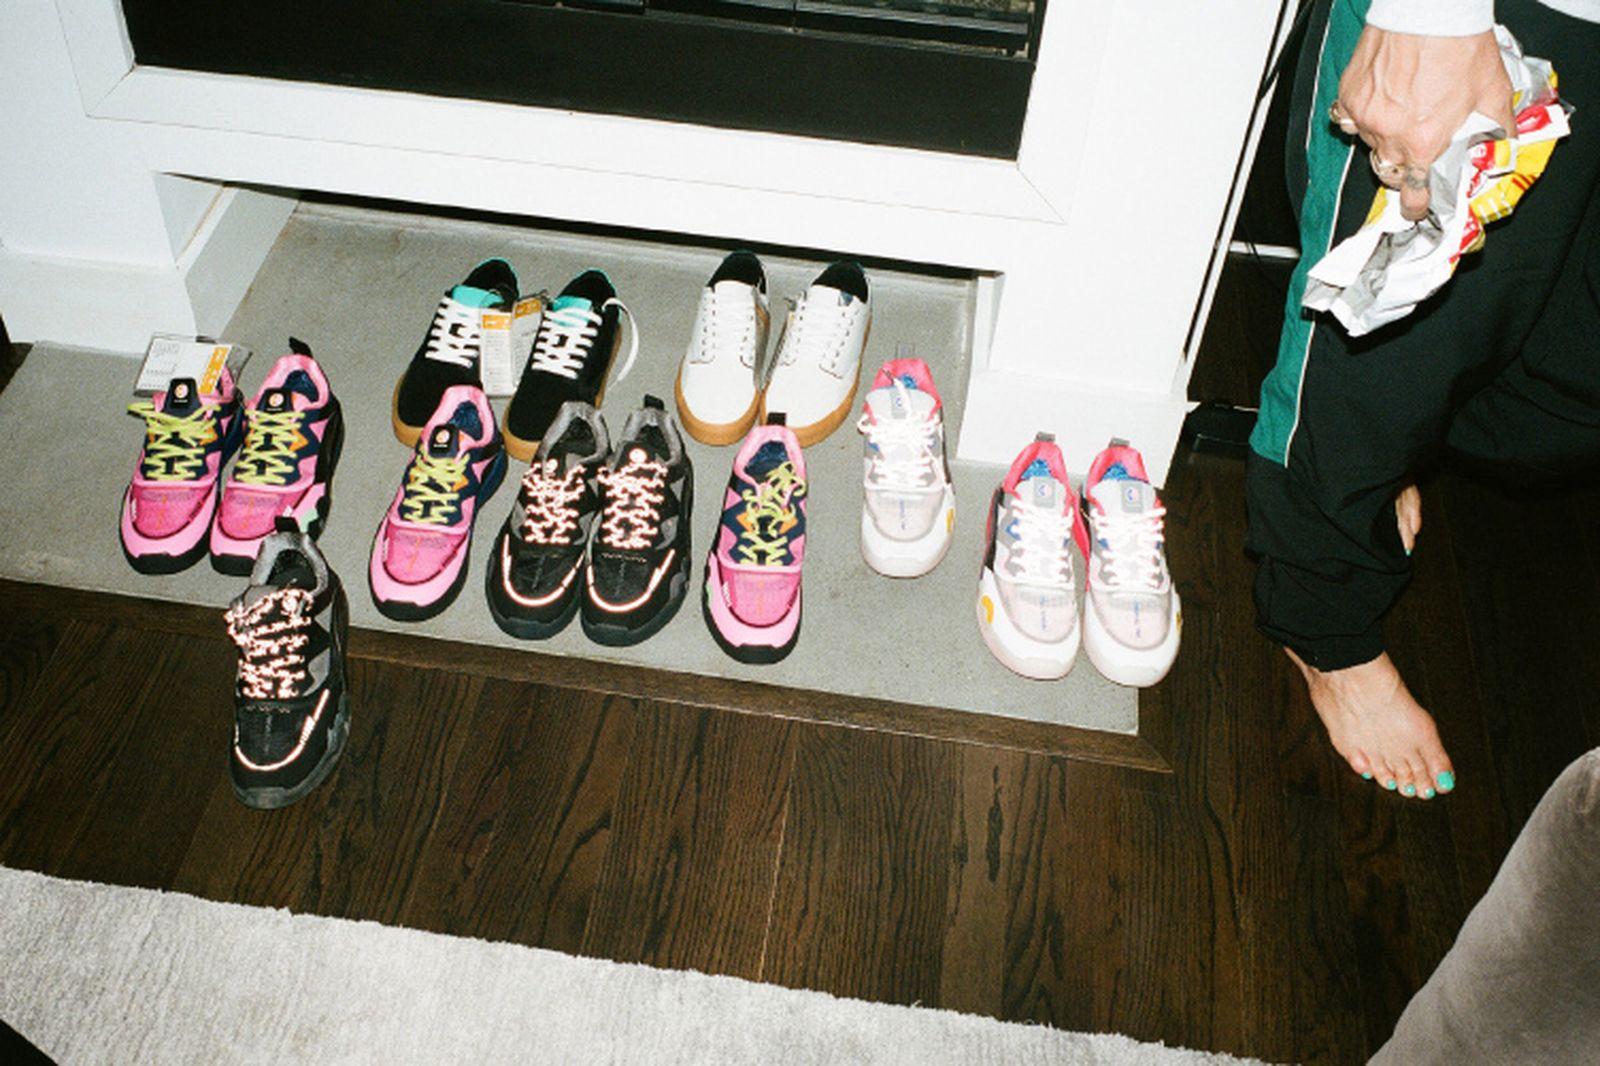 li-ning-skate-collection-erik-ellington-release-date-price-12